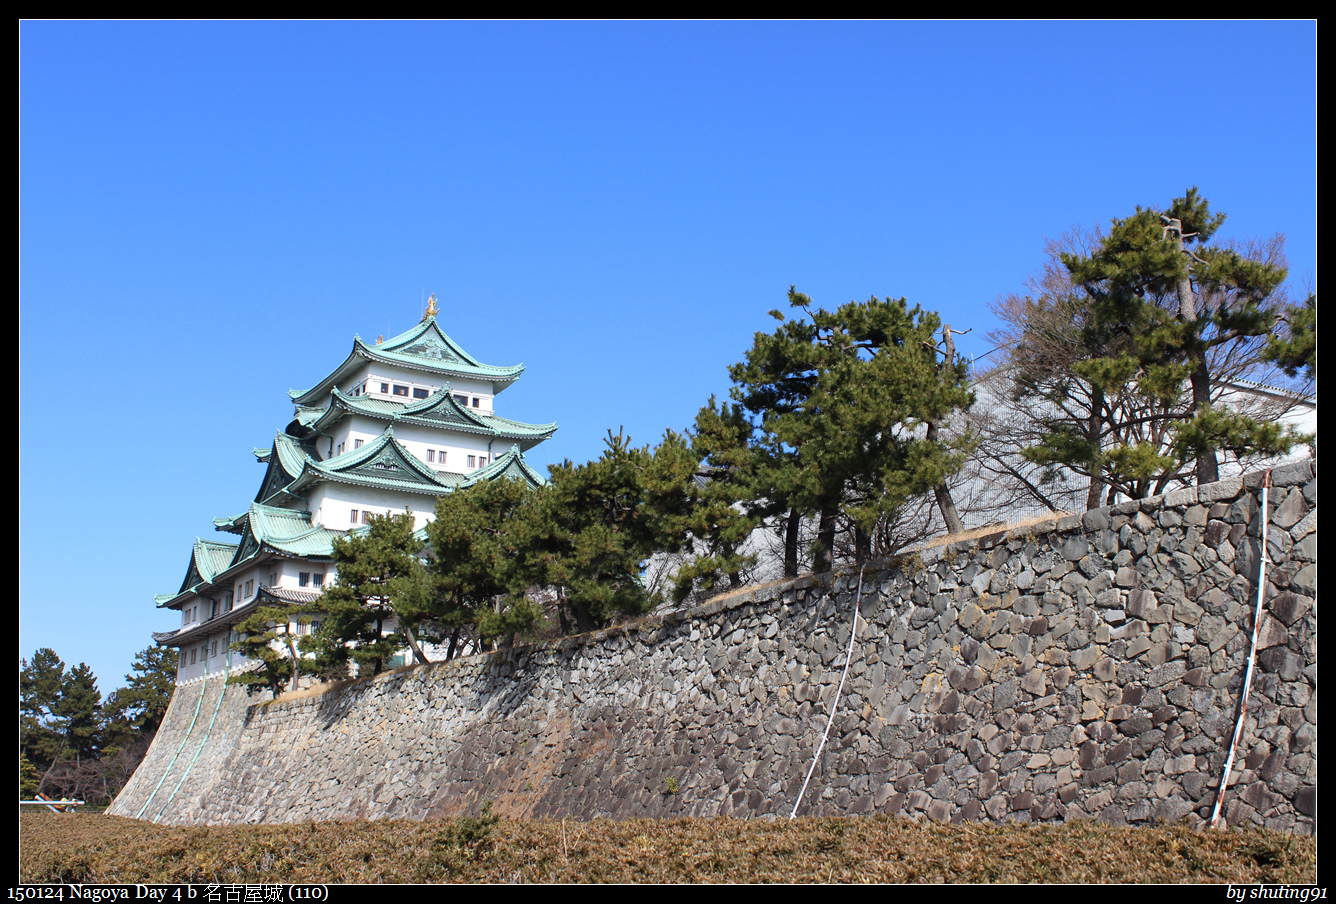 150124 Nagoya Day 4 b 名古屋城 (110).jpg